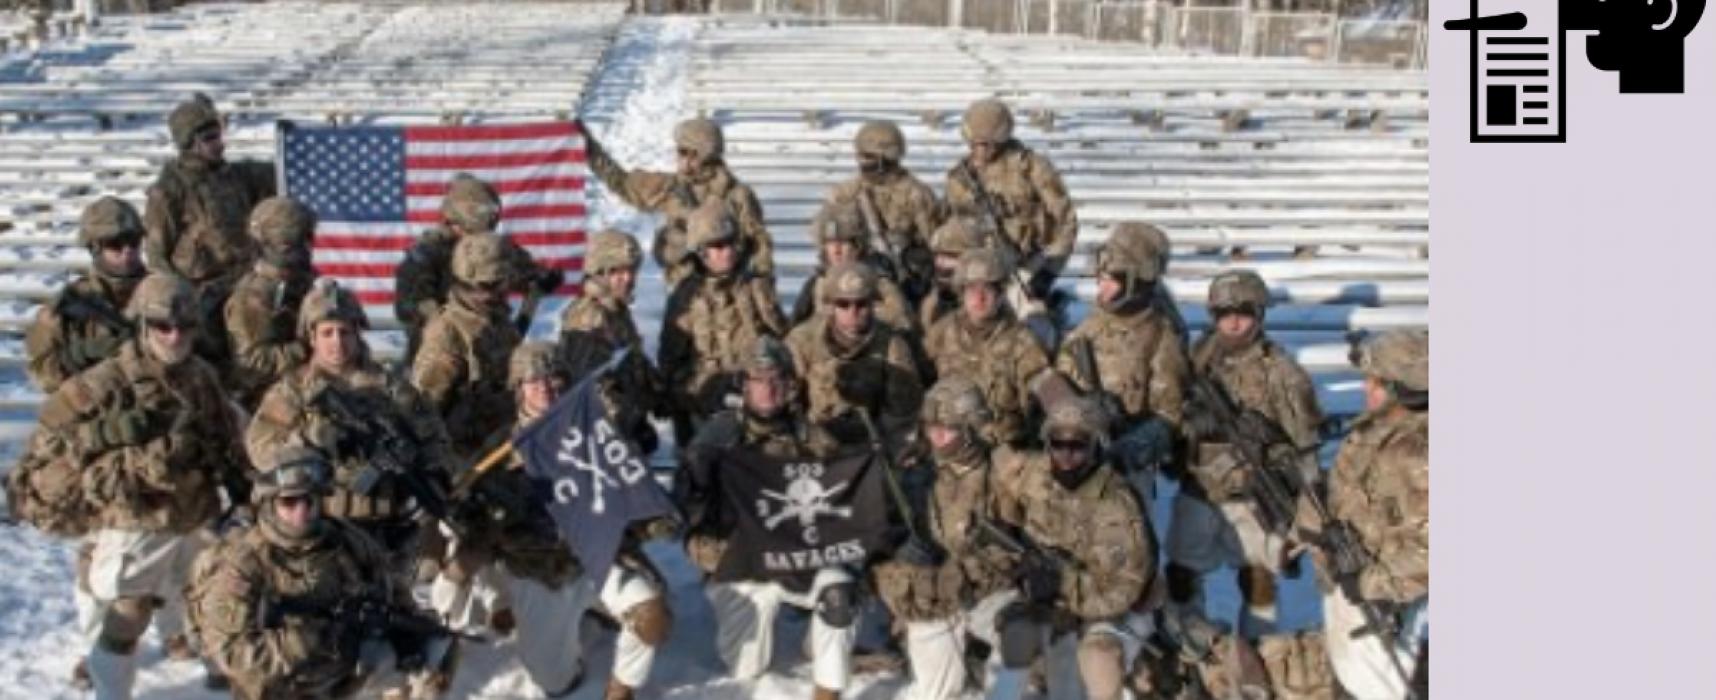 Фейк: Новая бригада натовцев прибыла на Донбасс